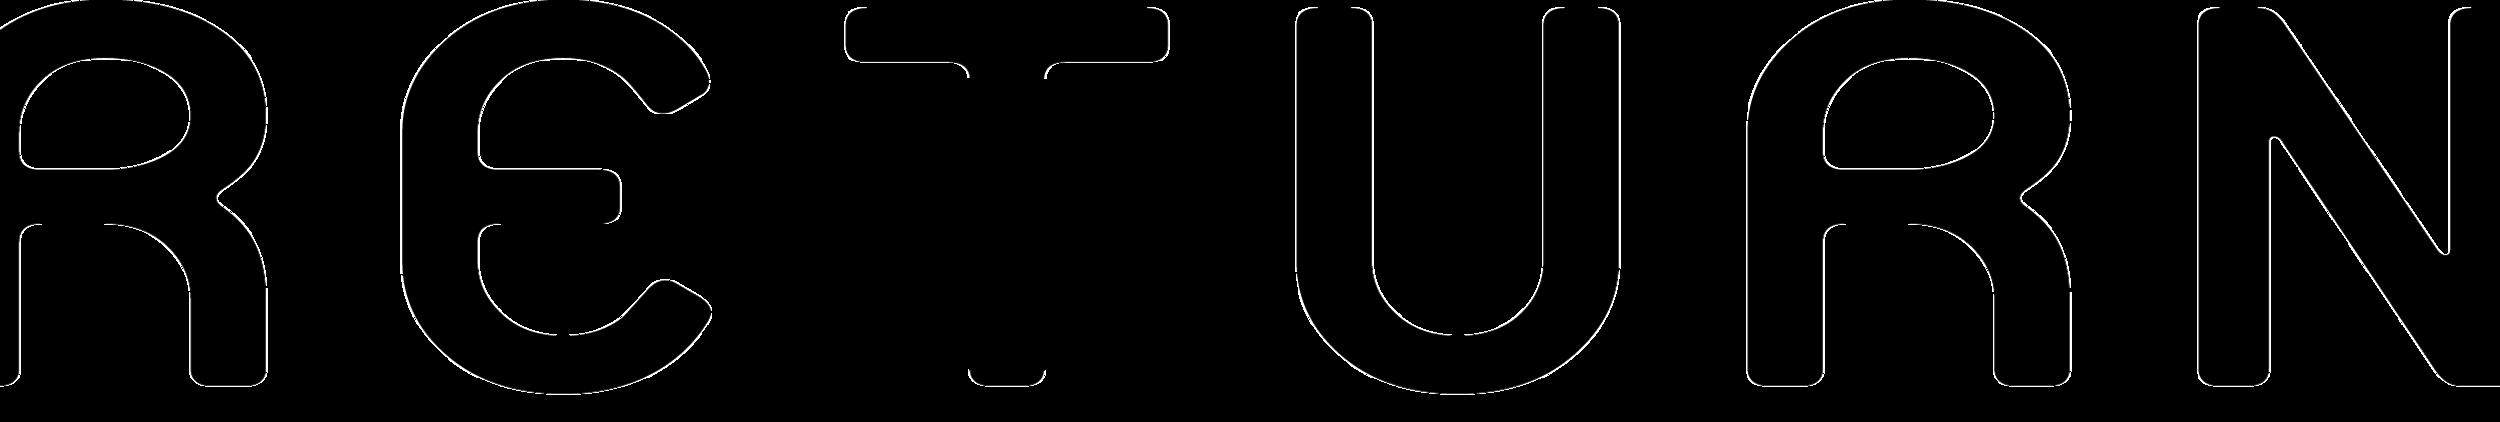 return-logo.png